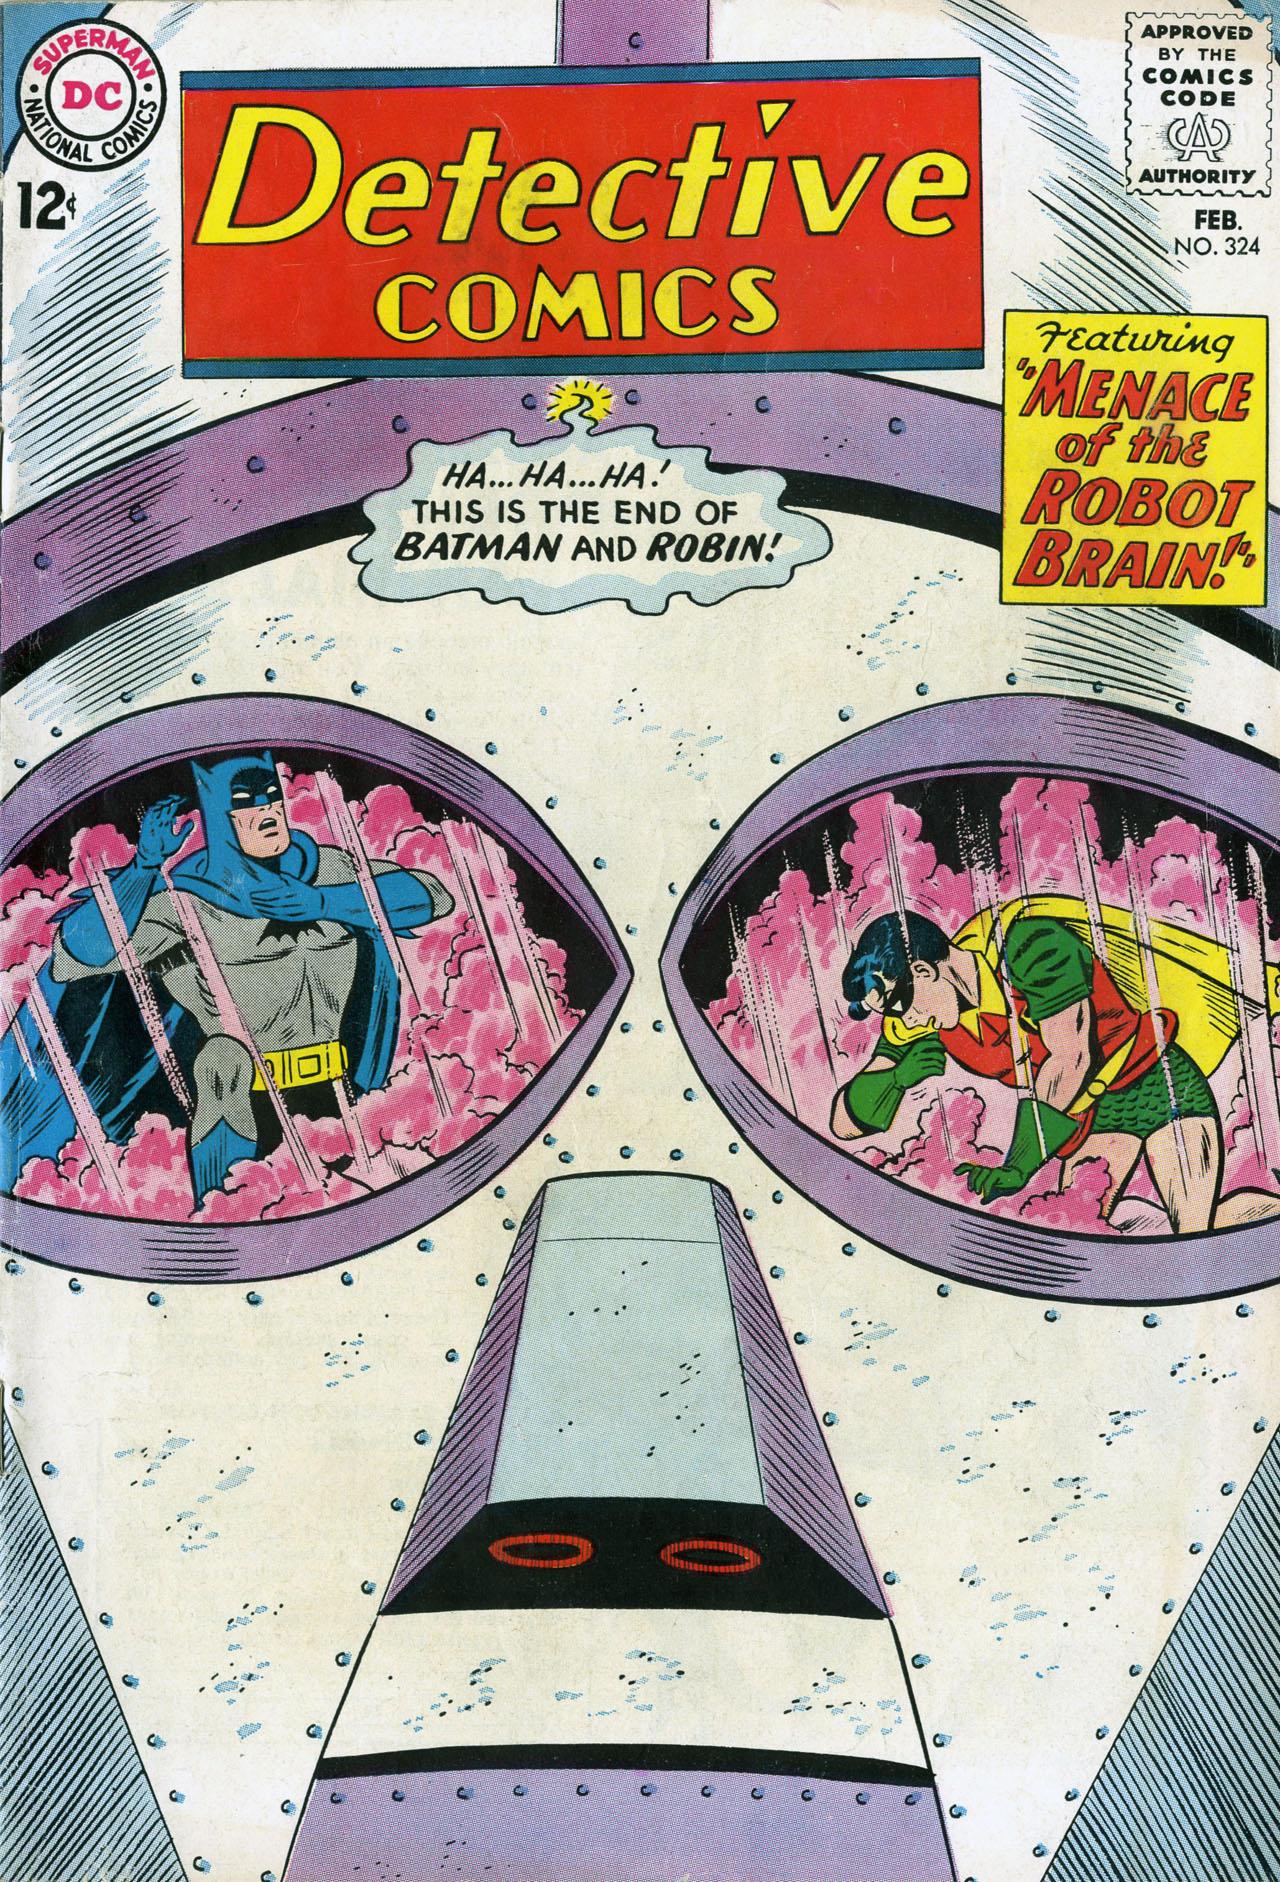 Detective Comics (1937) 324 Page 1